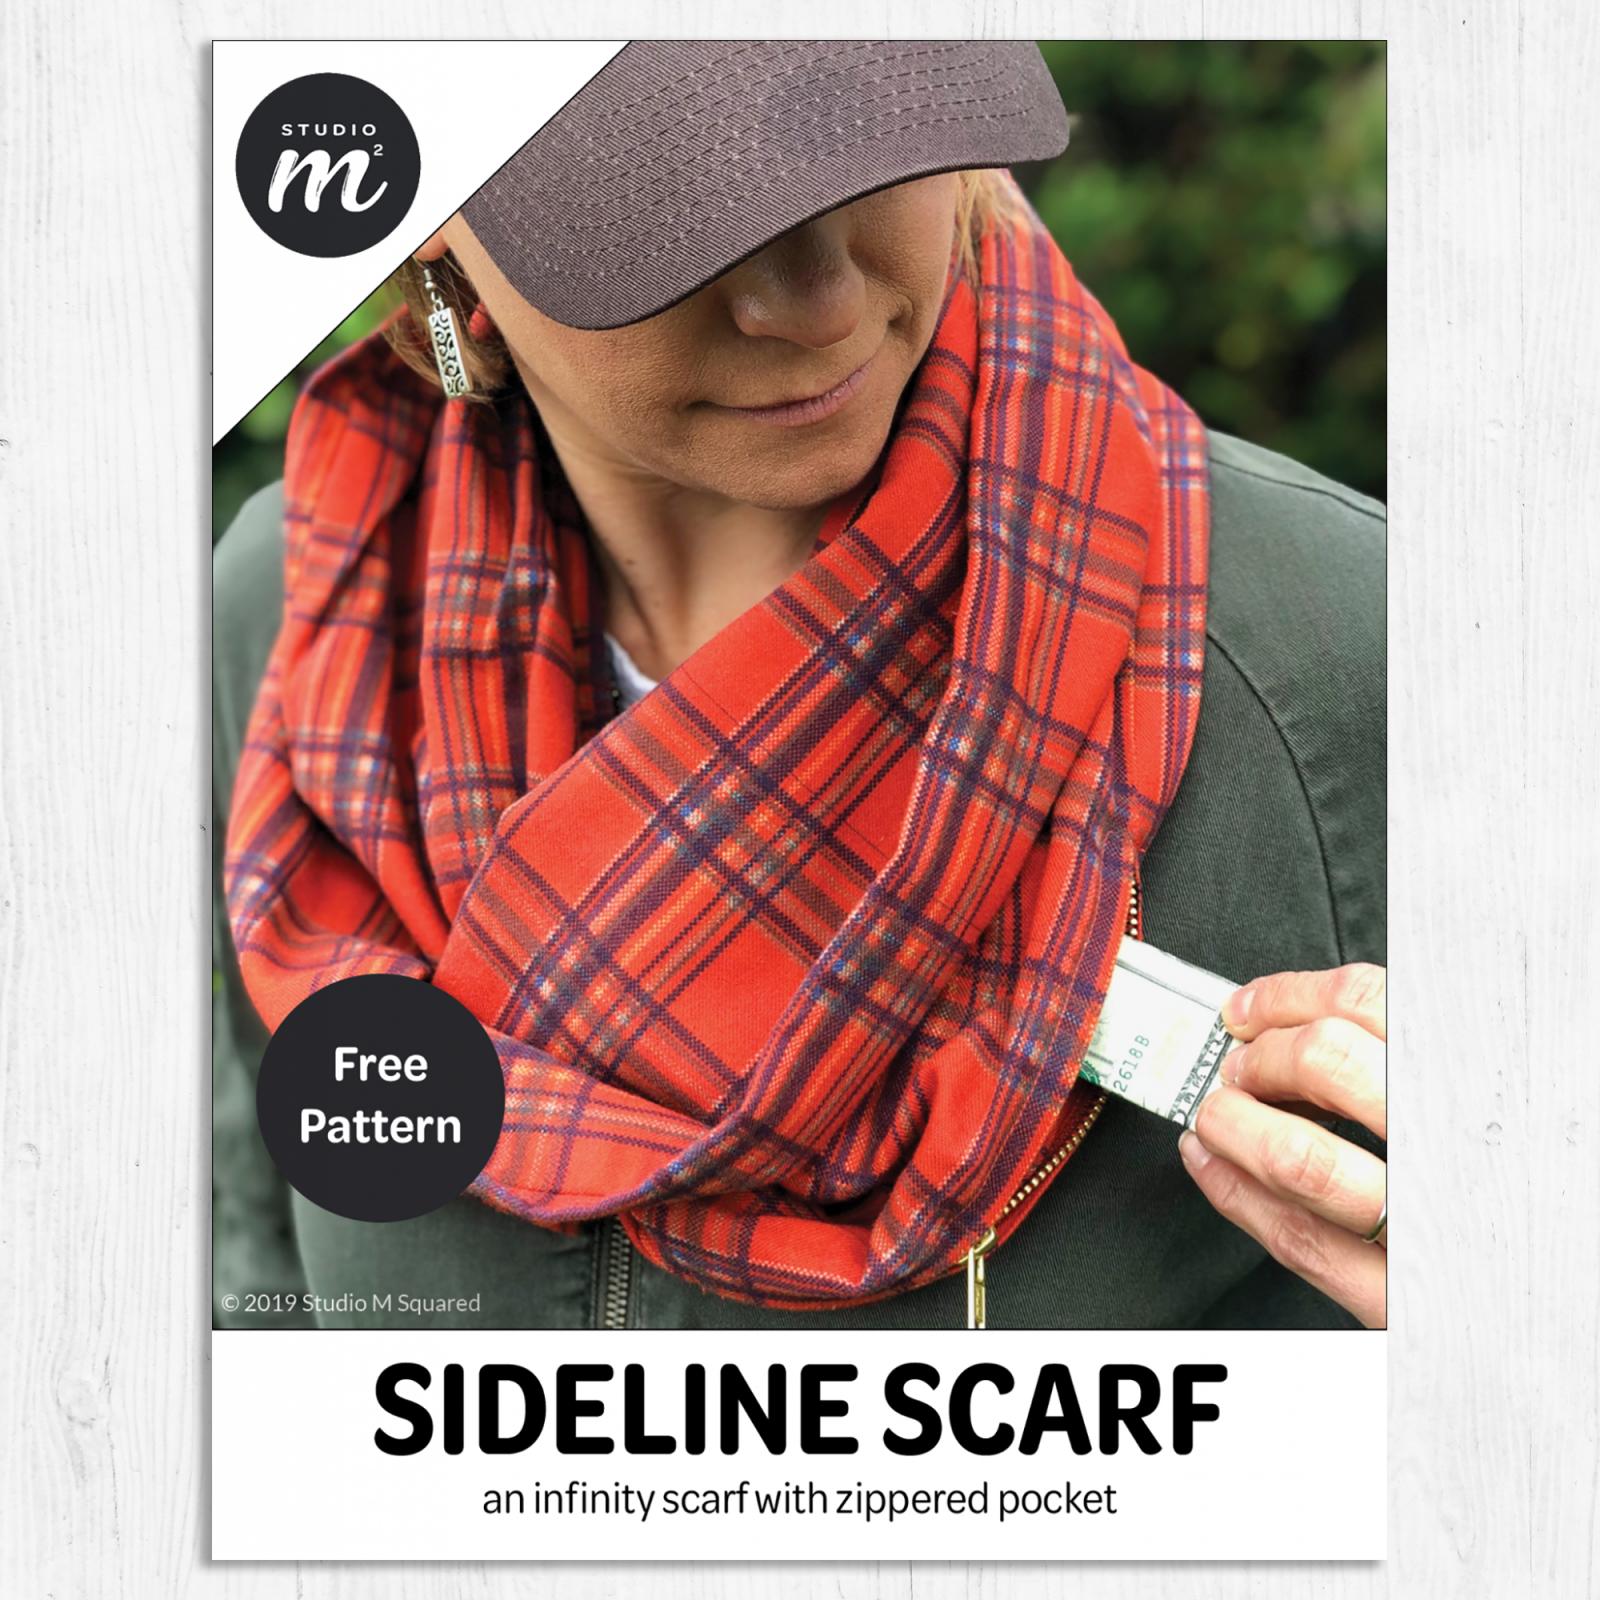 Studio M Squared - Sideline Scarf - FREE pattern